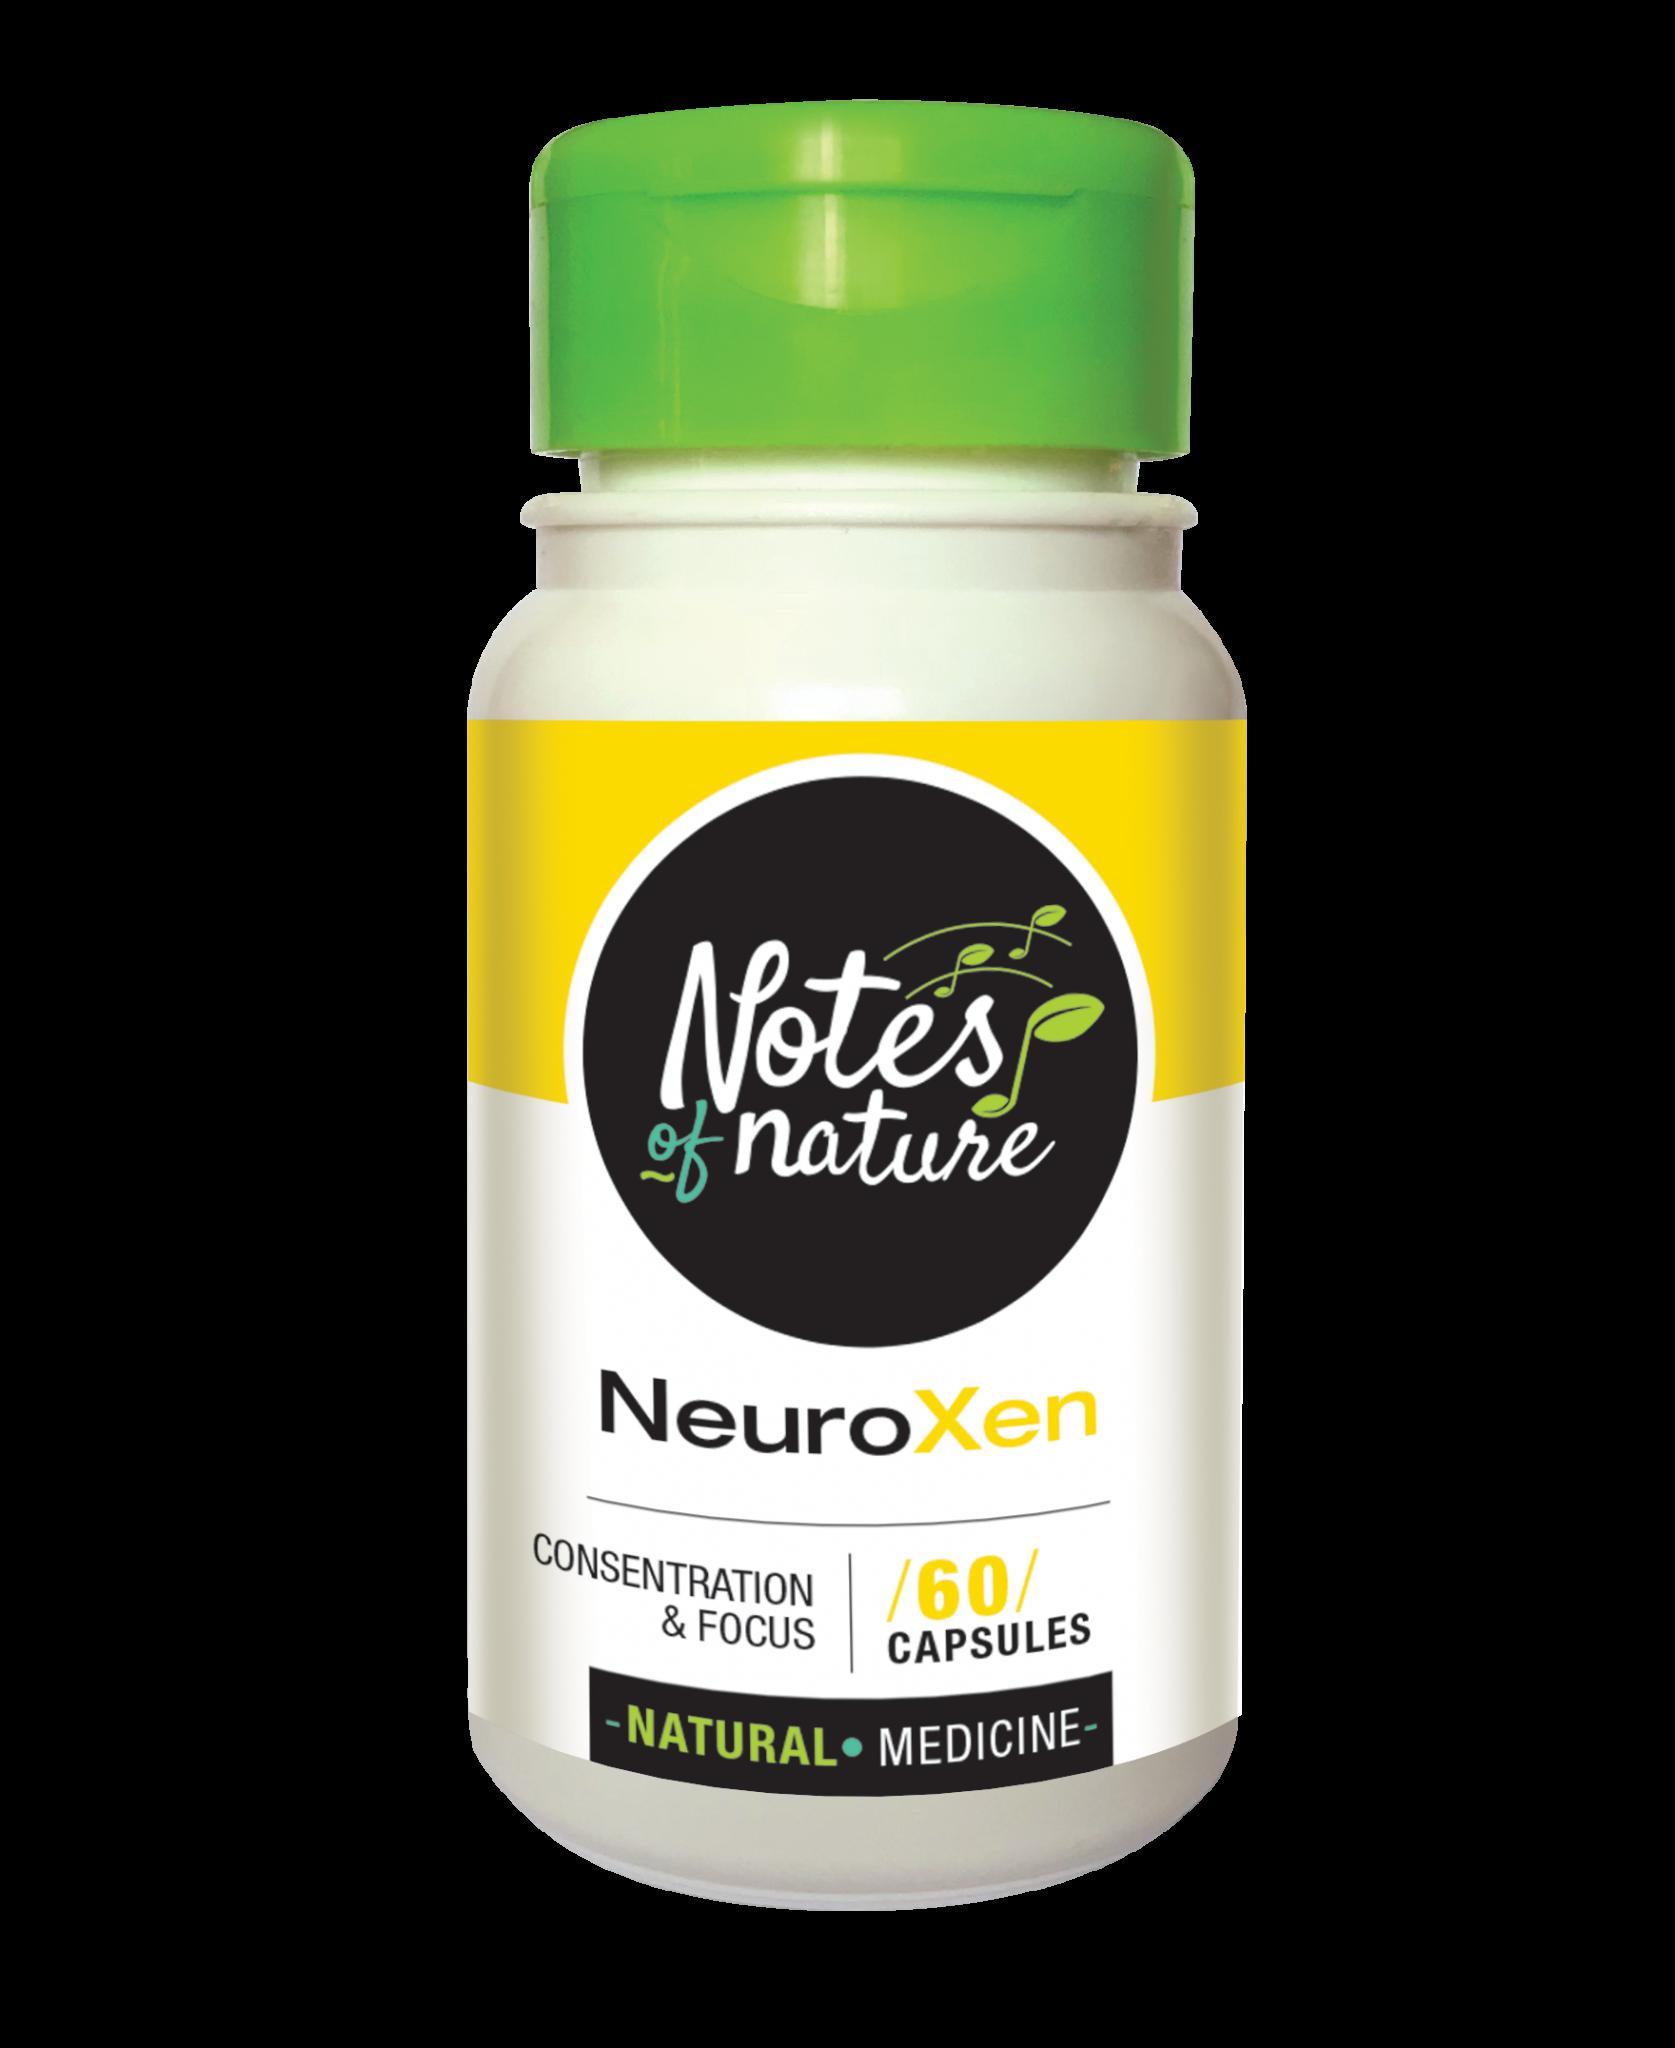 Notes of Nature NeuroXen